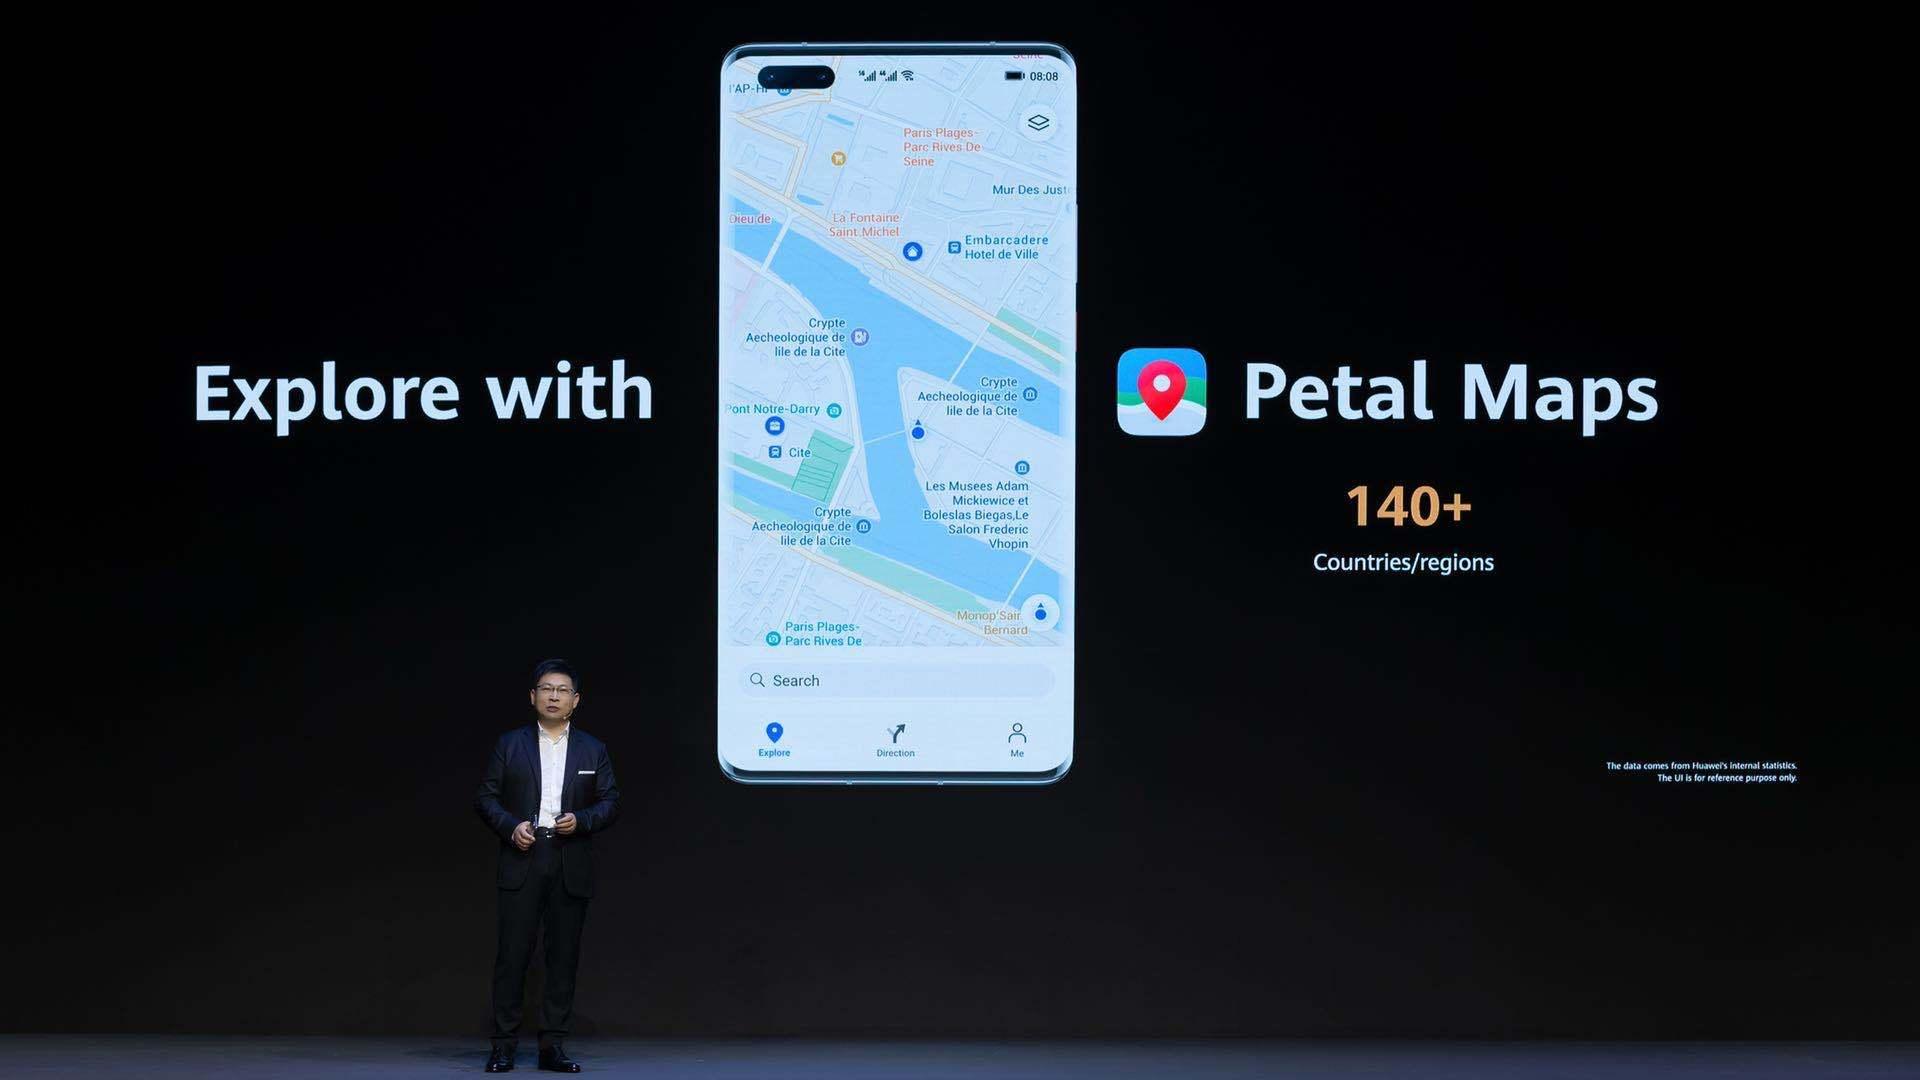 【Mate40系列手机发布,华为正式推出面向海外的搜索和地图应用】